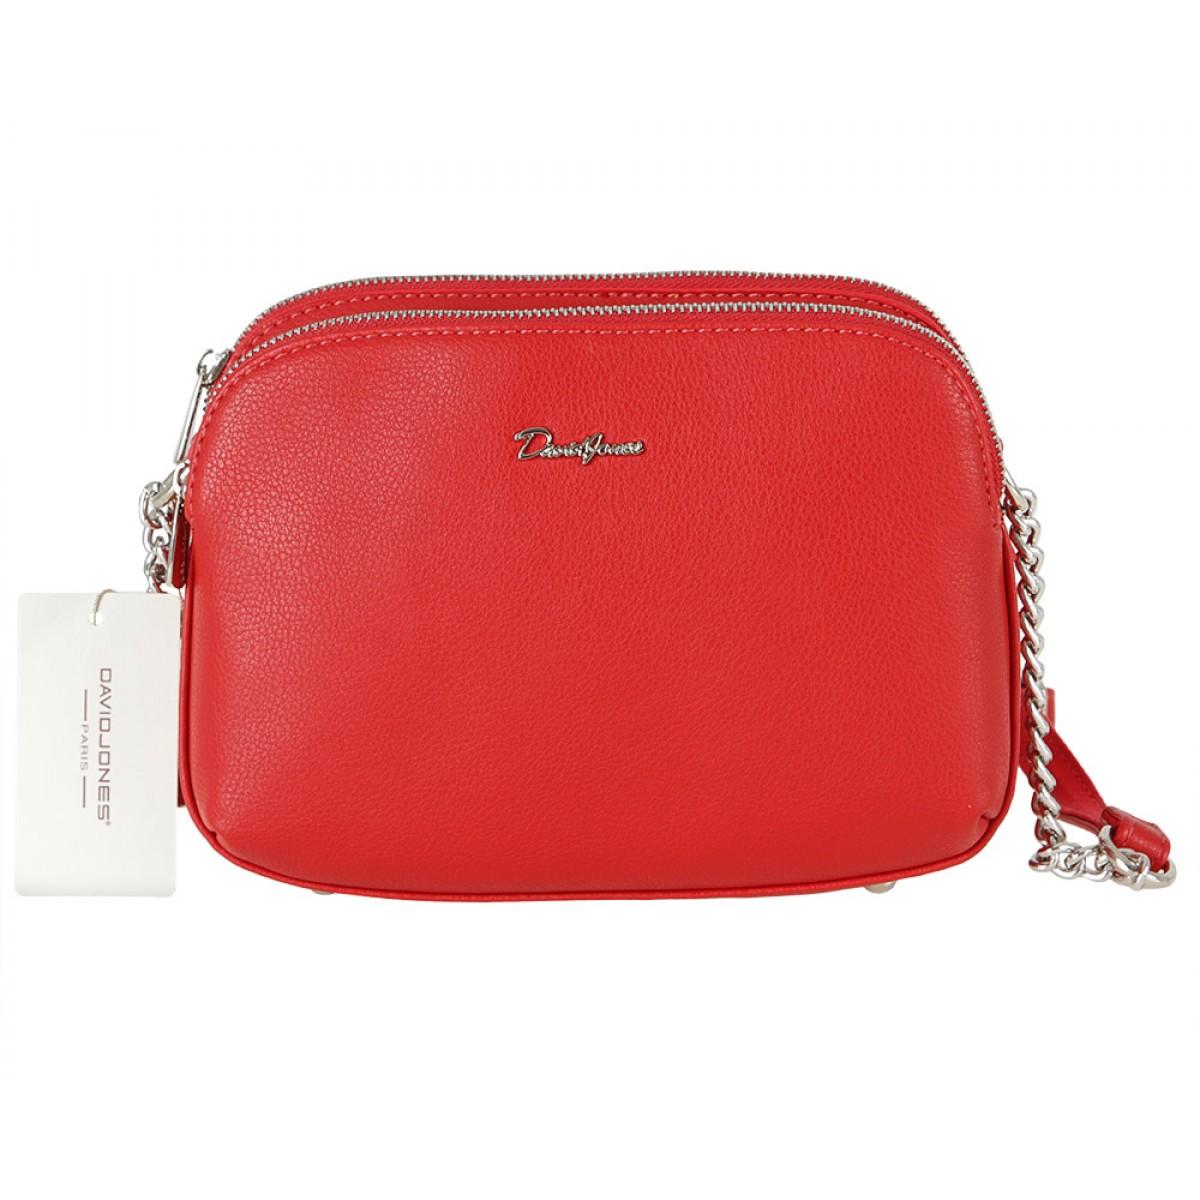 Жіноча сумка David Jones 6200-2A RED